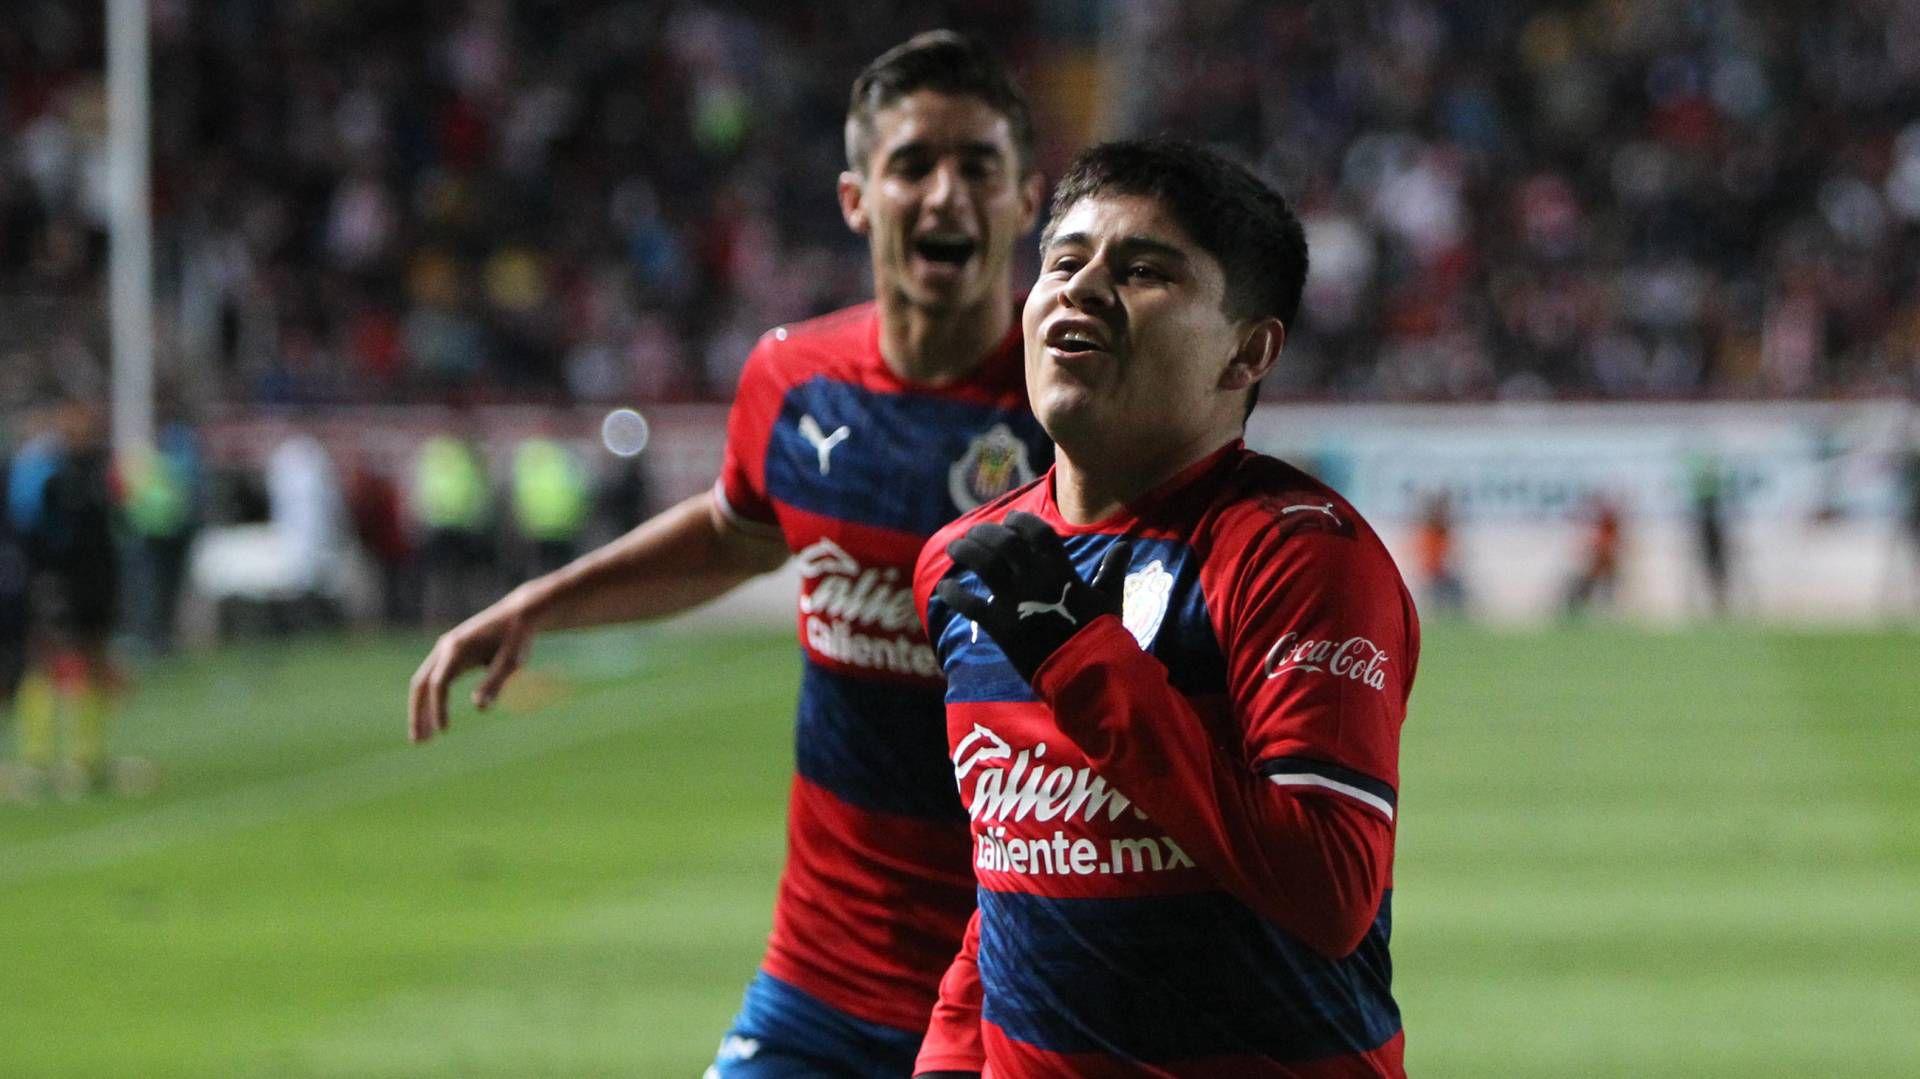 La Chofis López puso al frente a las Chivas de Guadalajara con un golazo (Foto: Twitter @Chivas)